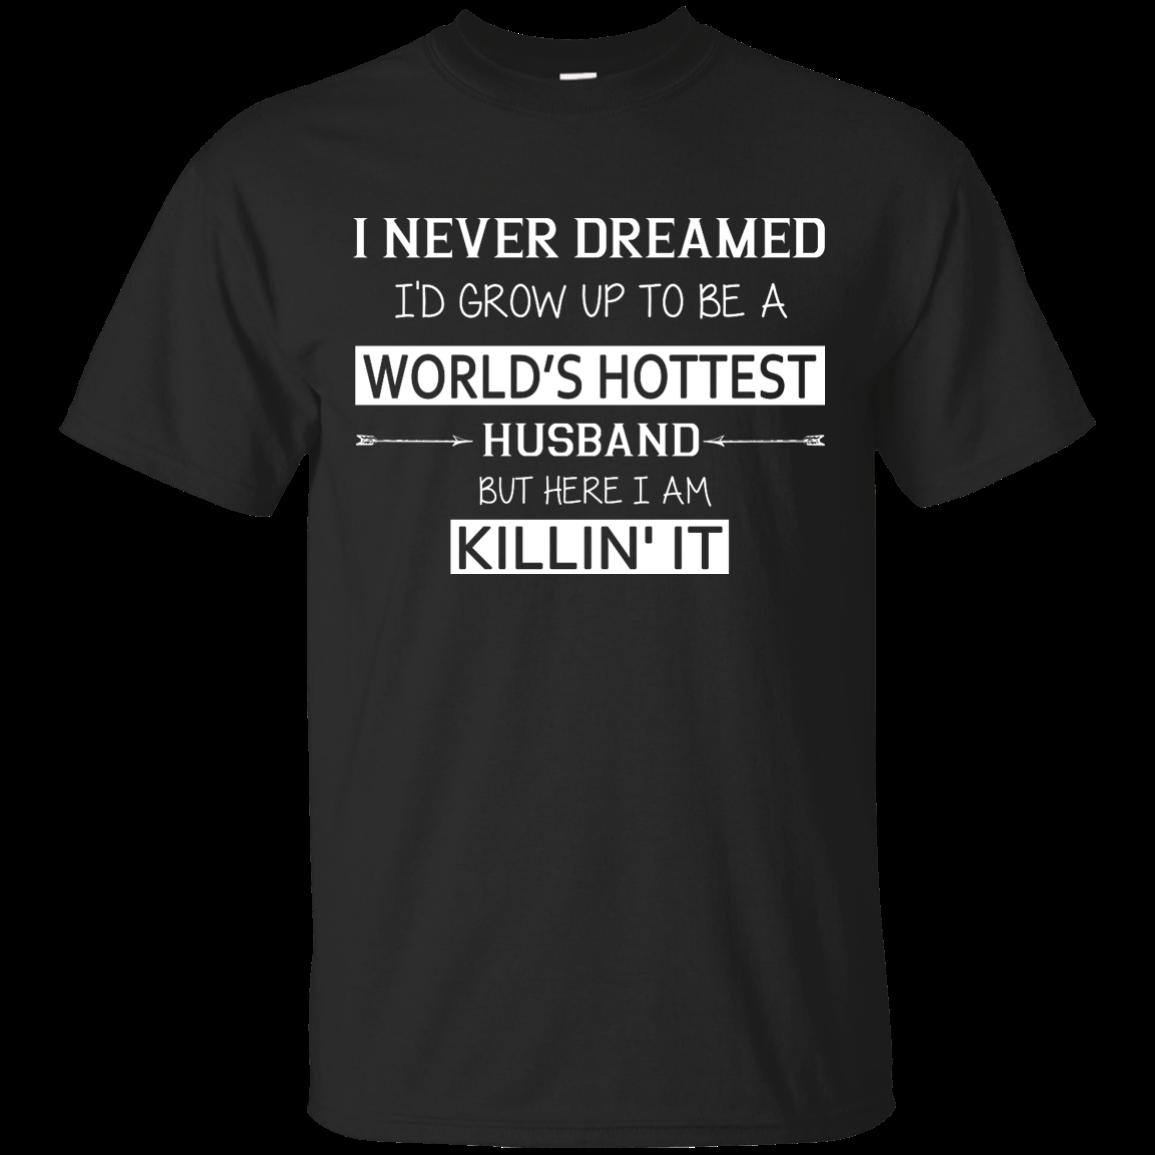 I Never Dreamed Grow Up World's Hottest Husband shirt, sweater, tank